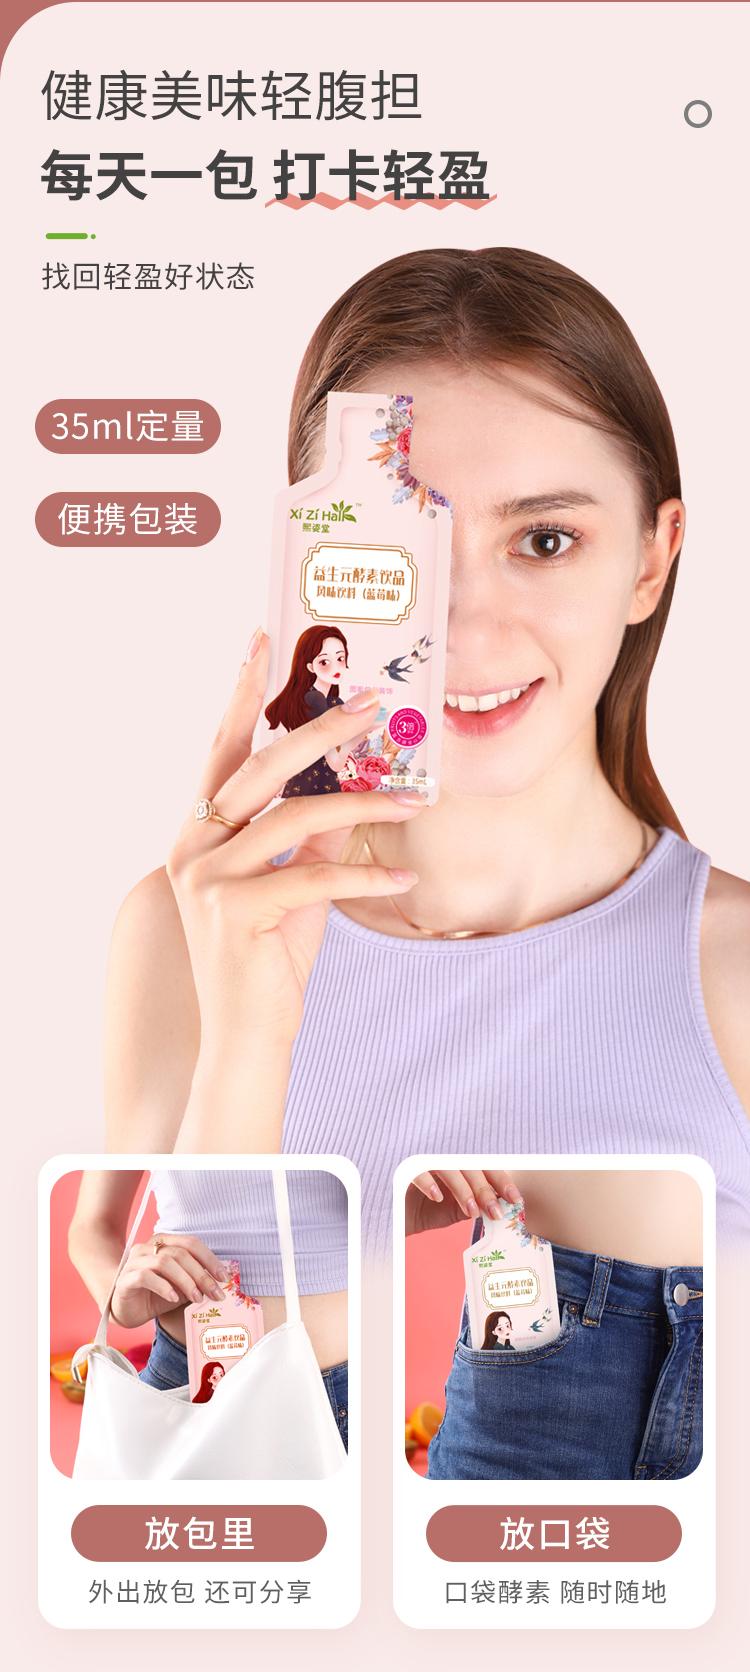 http://img.toumeiw.cn/upload/images/20210907/f5f189141a8a2feda90cb0b2c7a61c8d.jpg